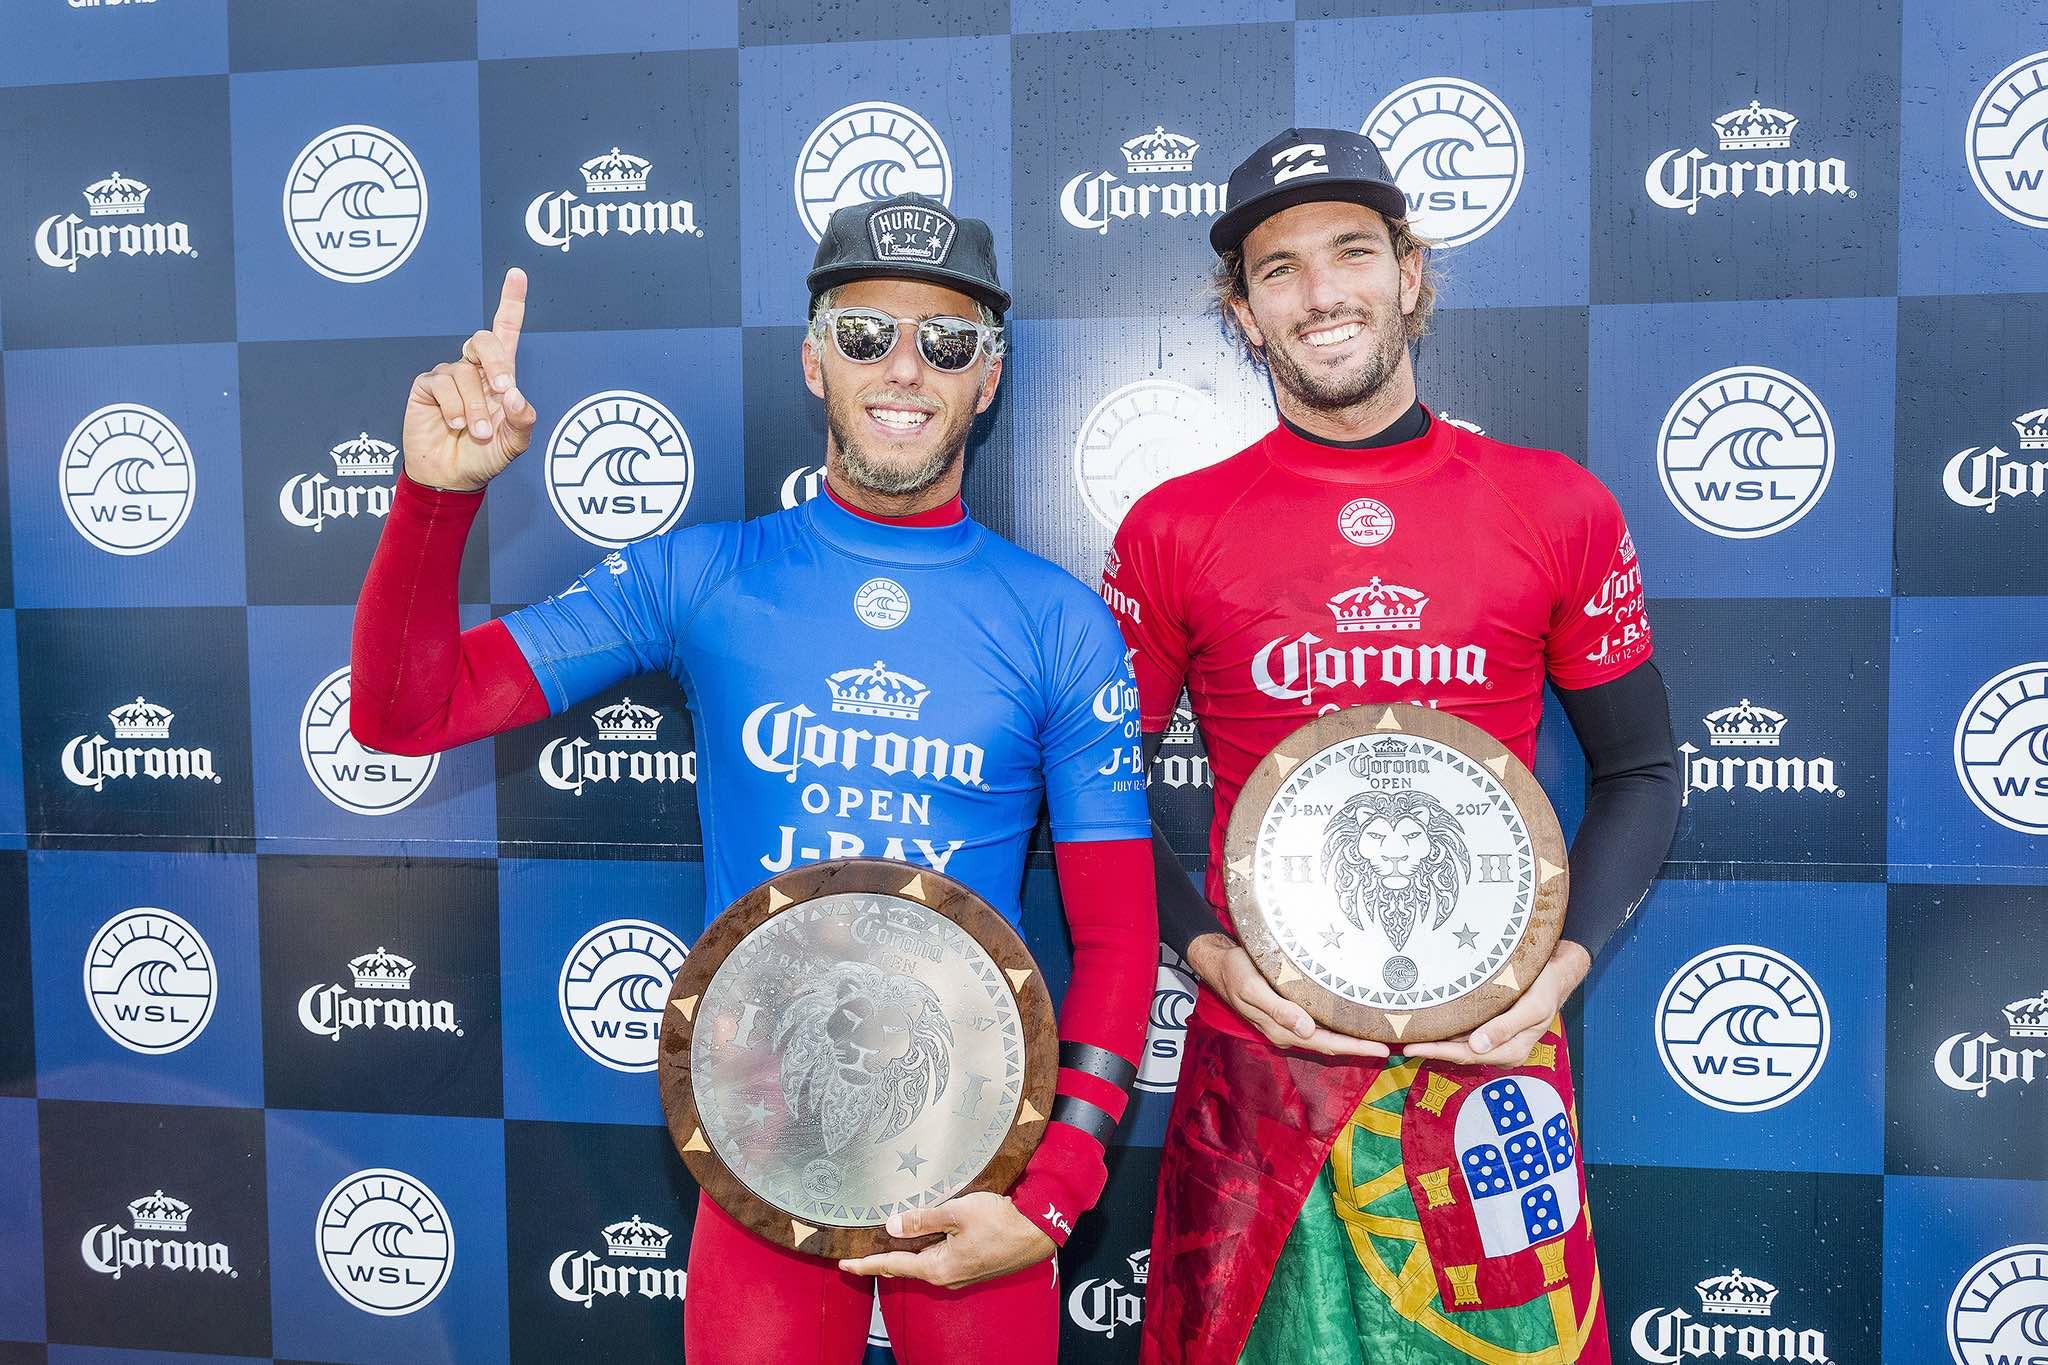 Corona Open J-Bay finals podium